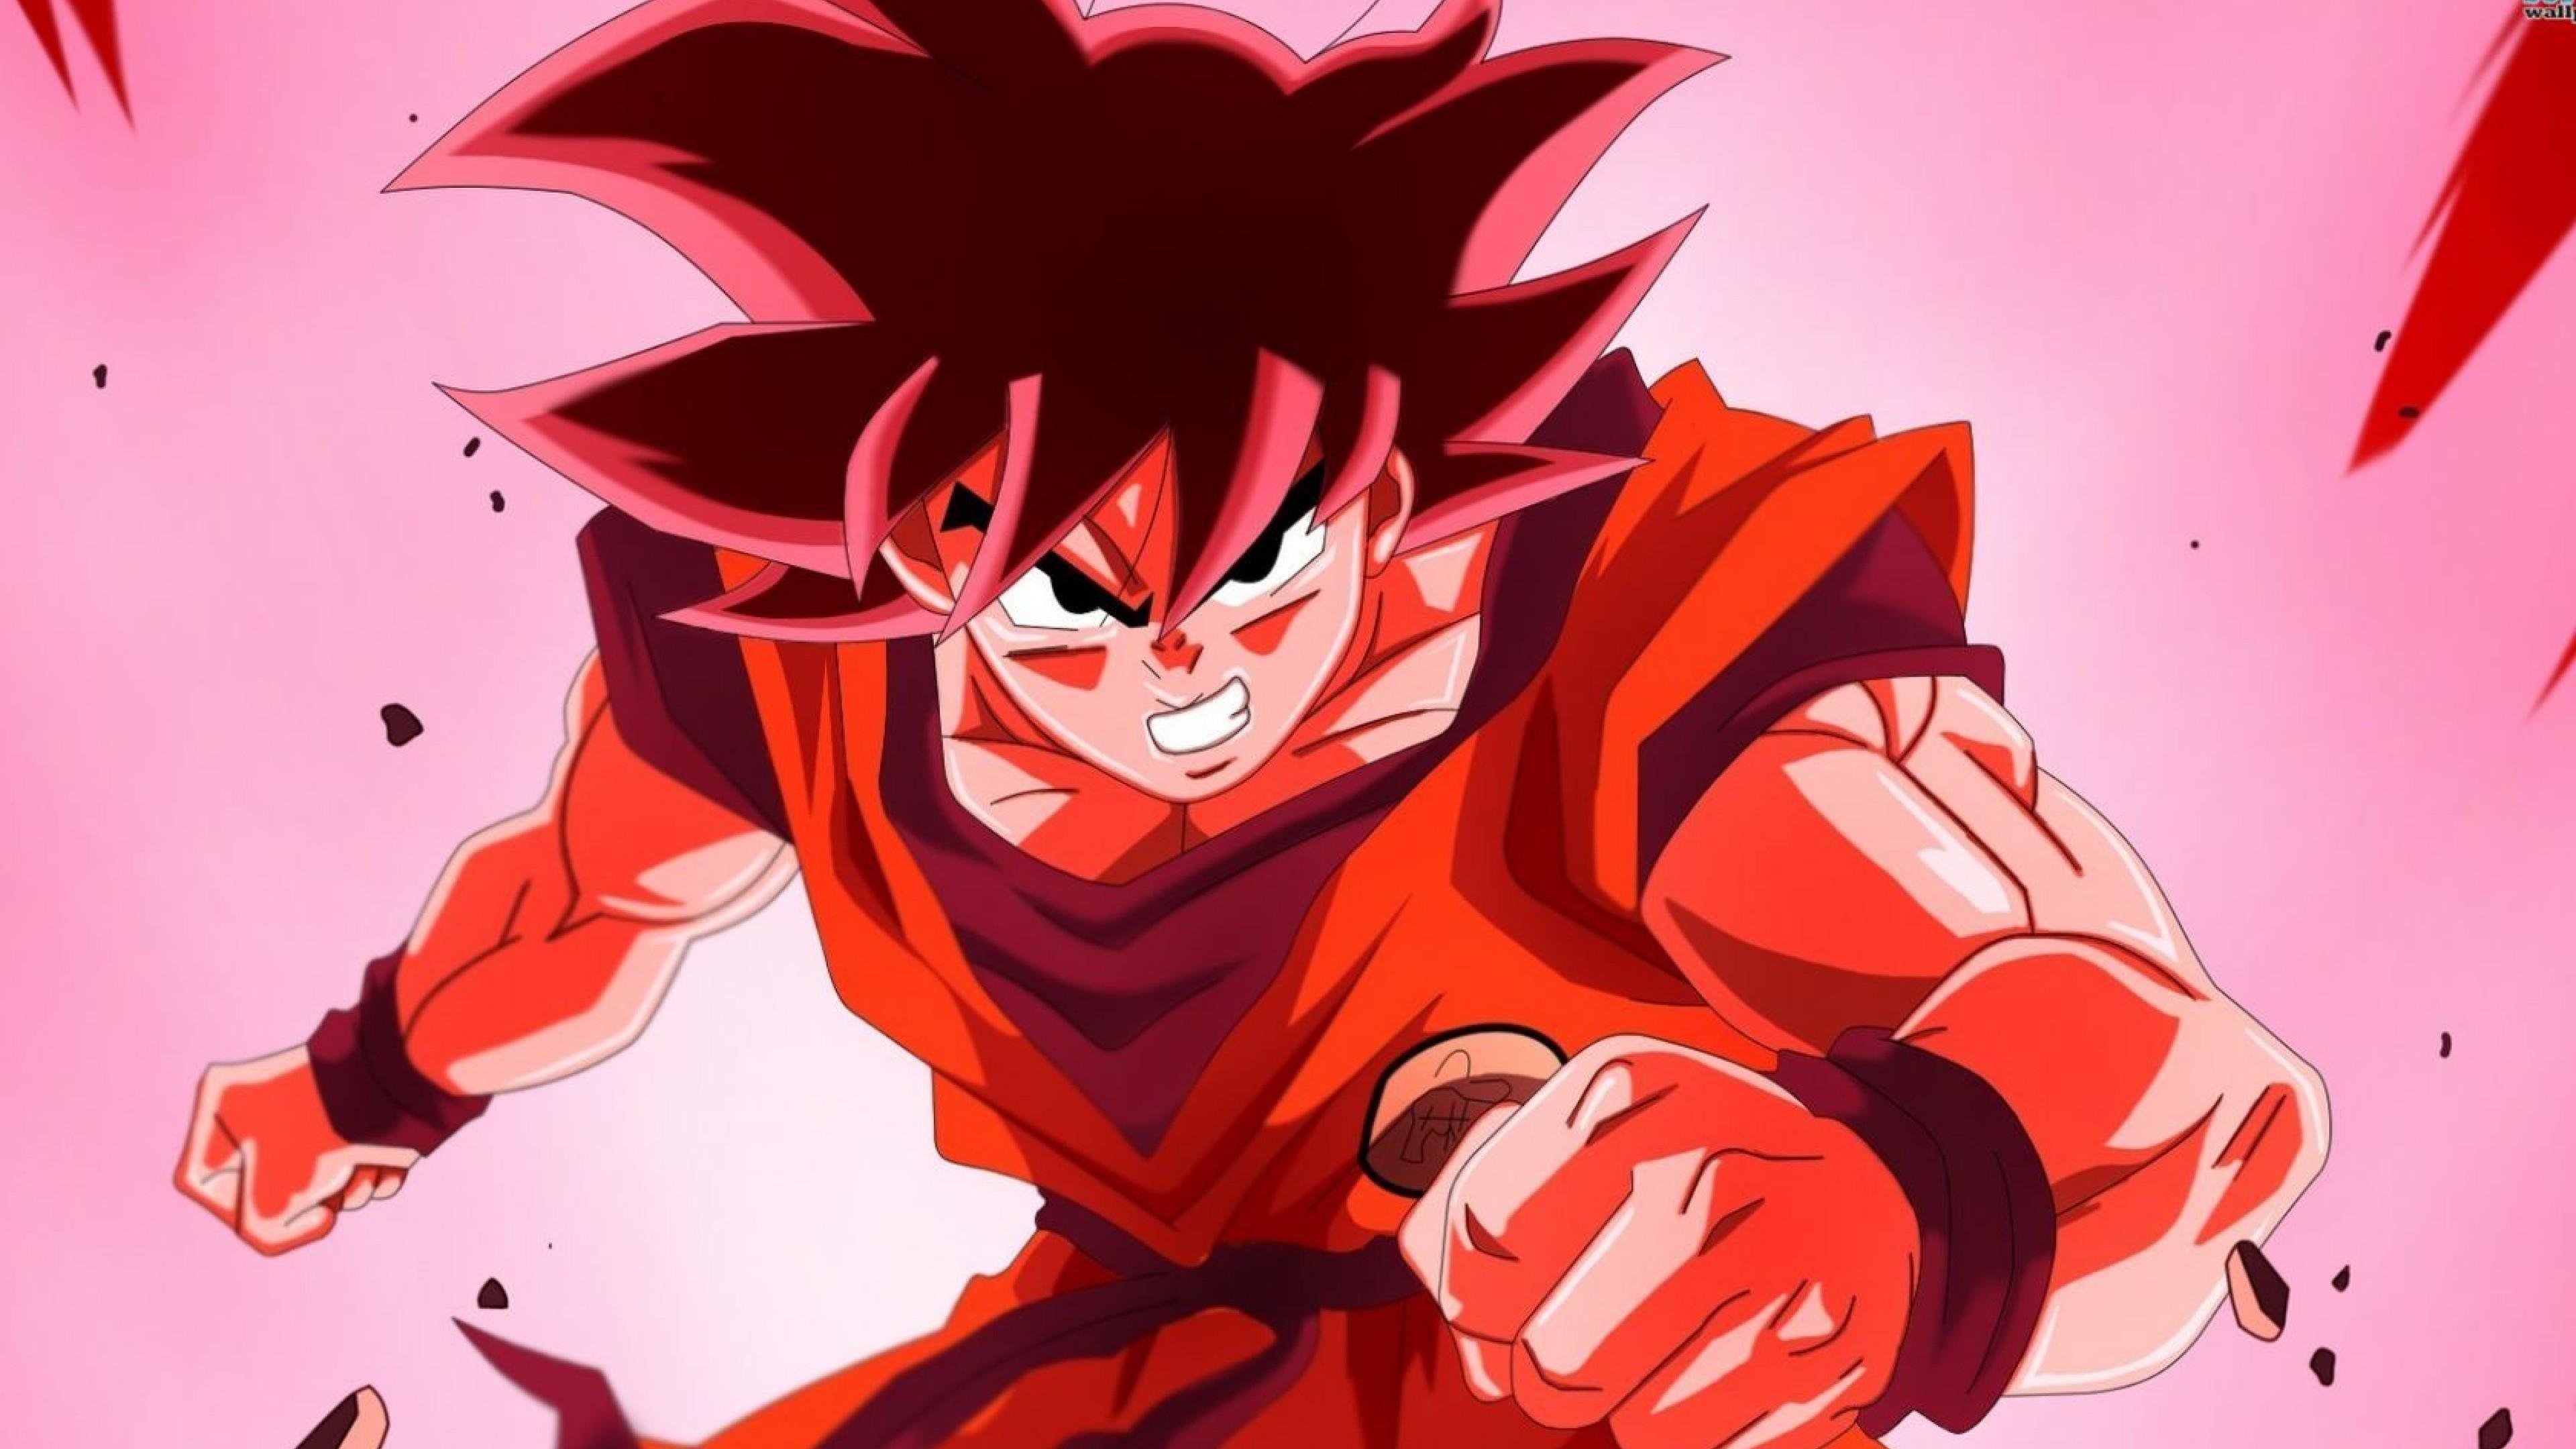 Goku Red Dragonball Z Wallpaper For Desktop And Mobiles 4k Ultra Hd